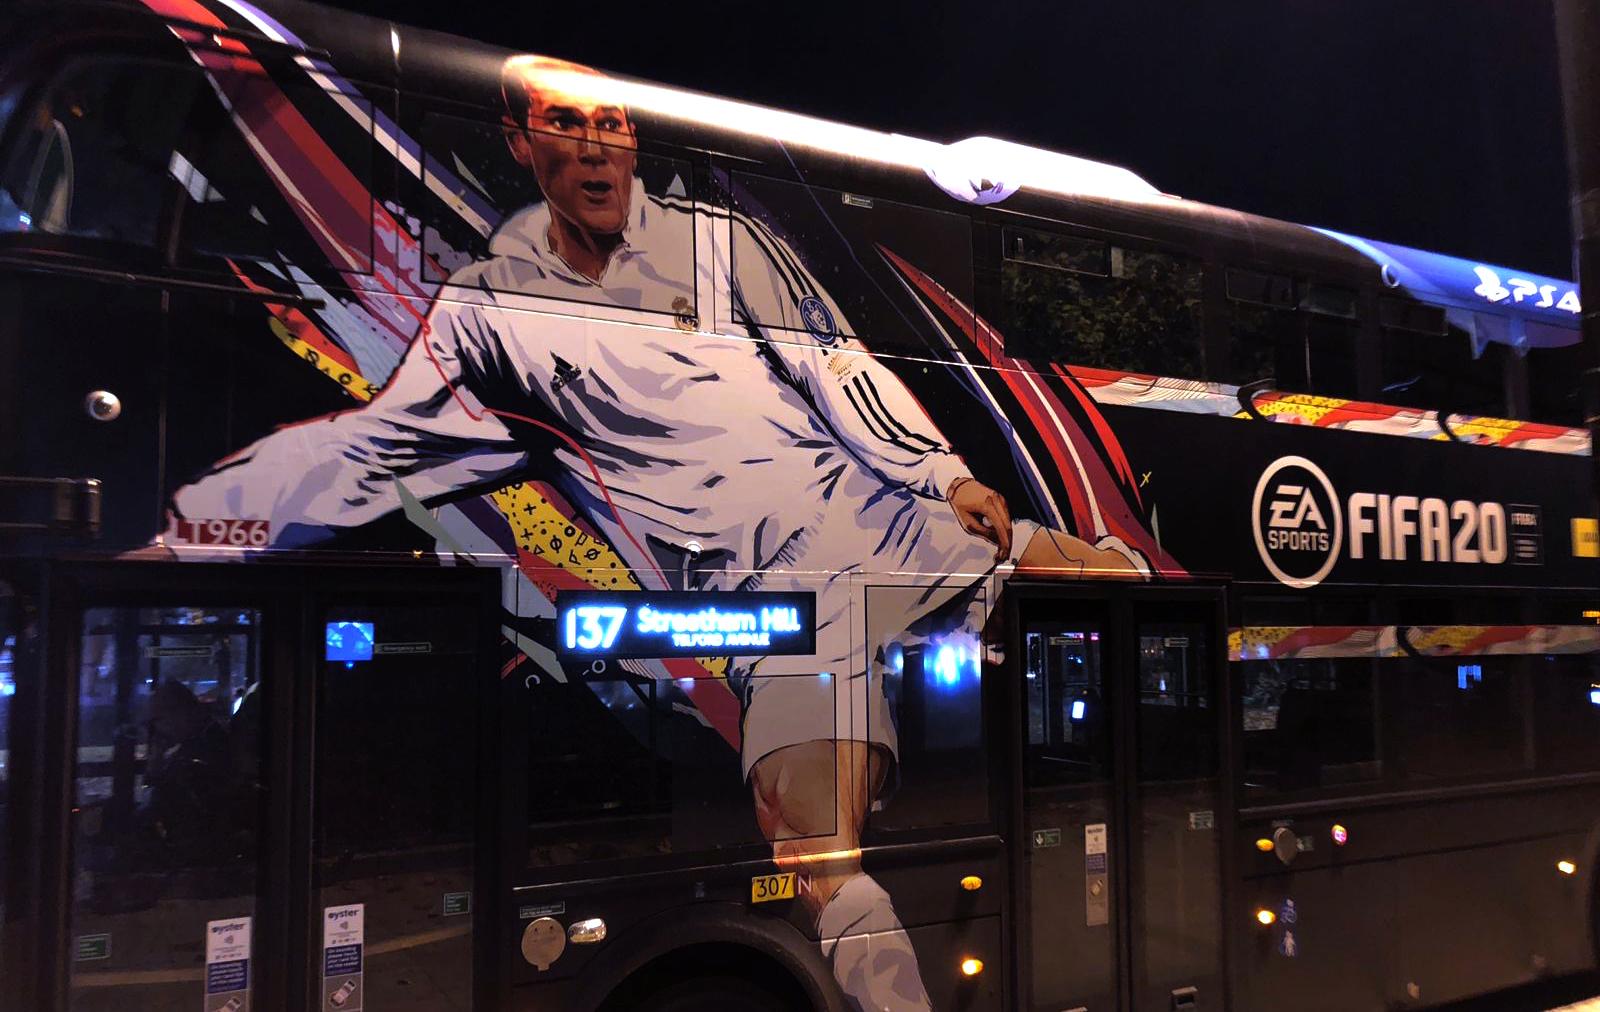 bus-wrap-ooh-artwork-fifa